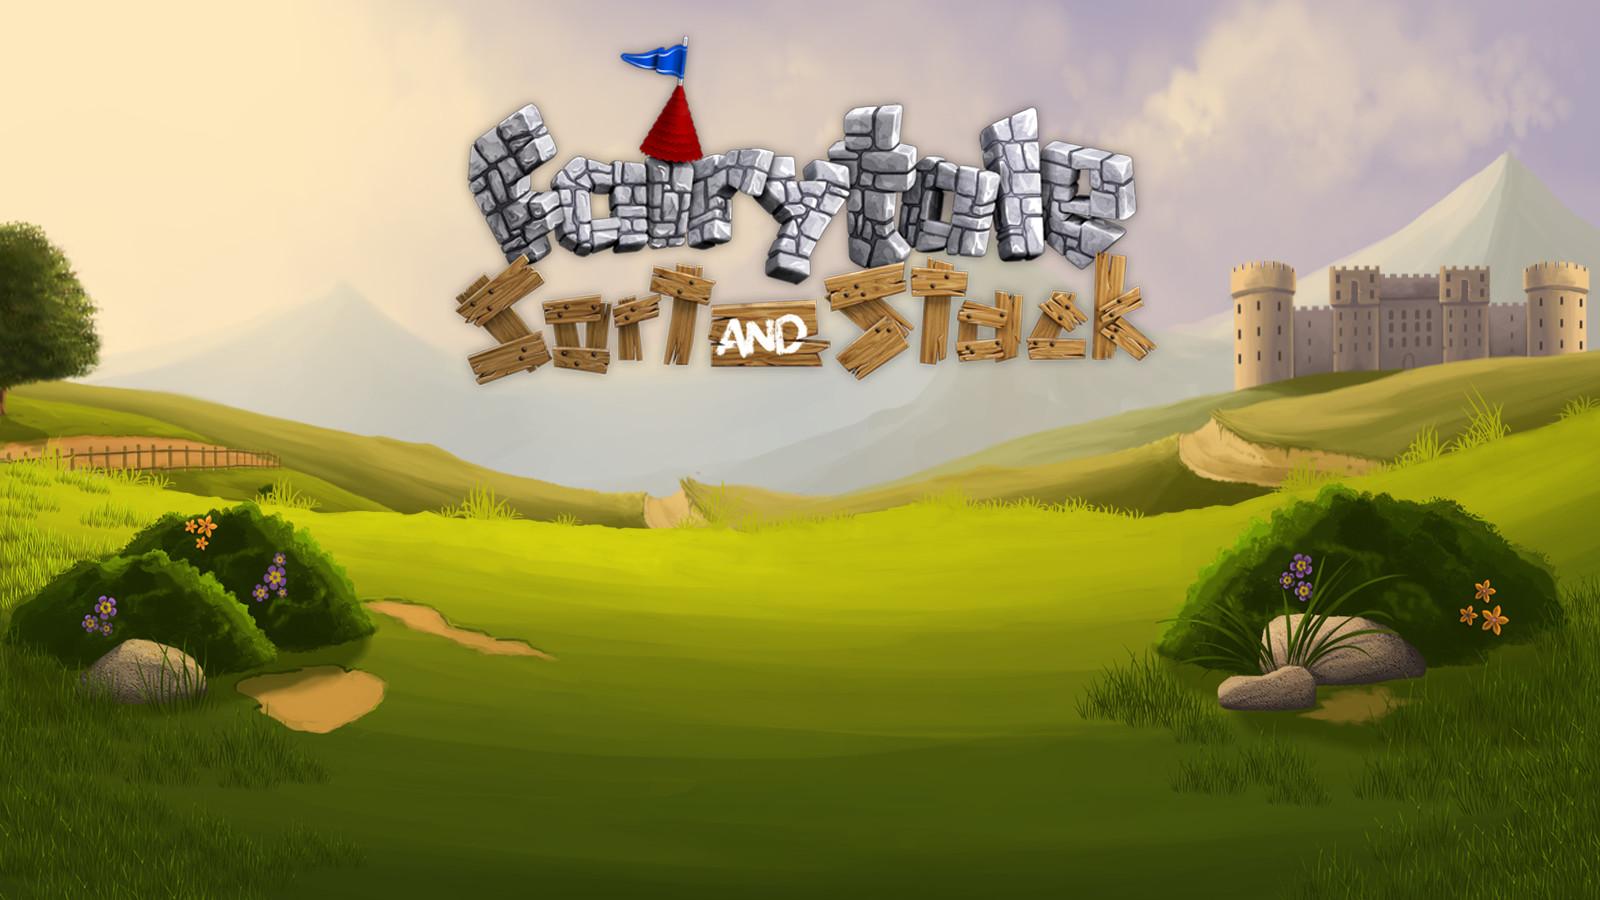 Fairytale Sort & Stack